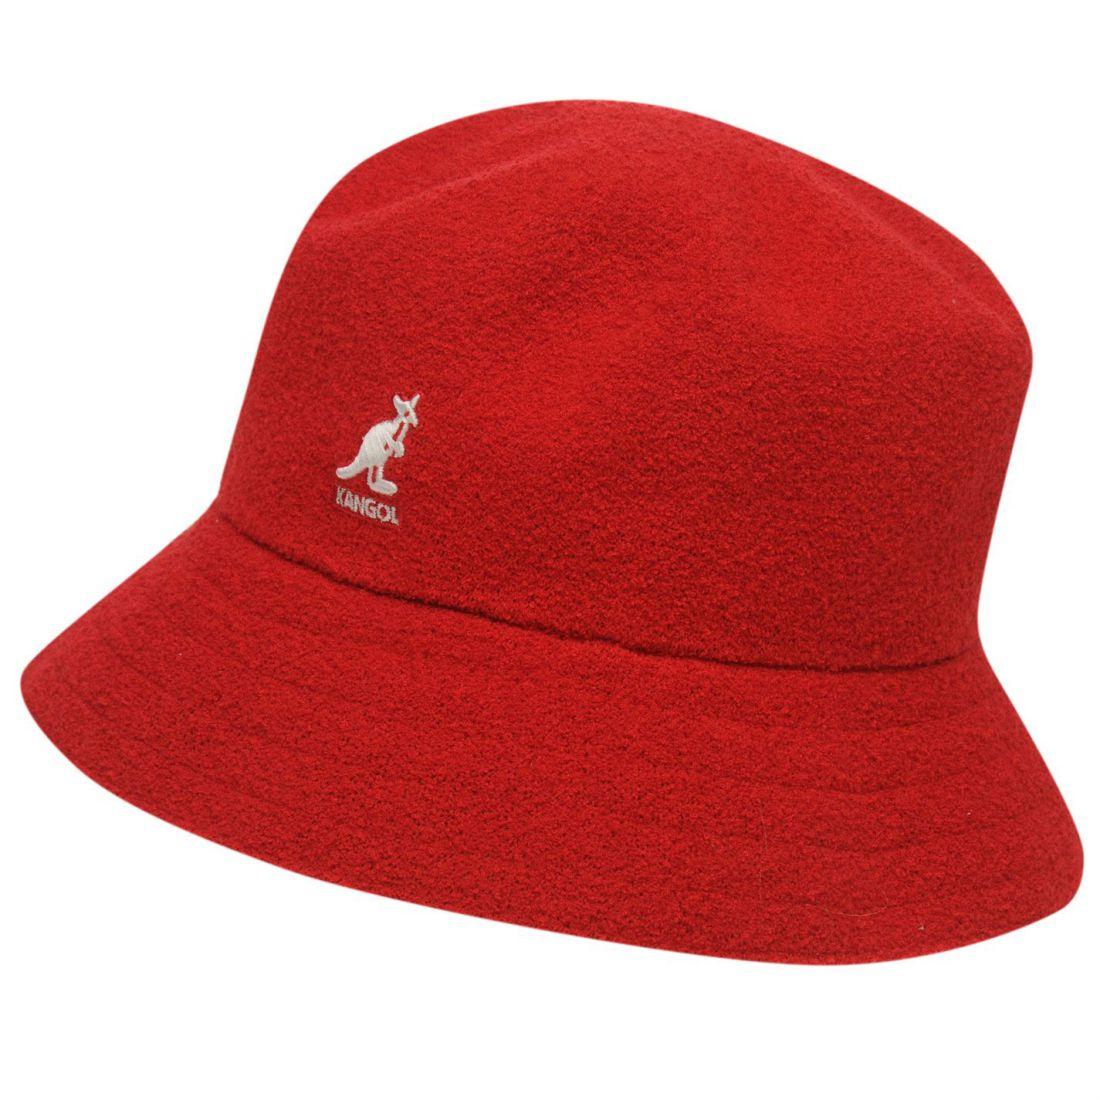 1c91d48526f KANGOL BOUCLE BUCKET Hat Mens Gents - EUR 23